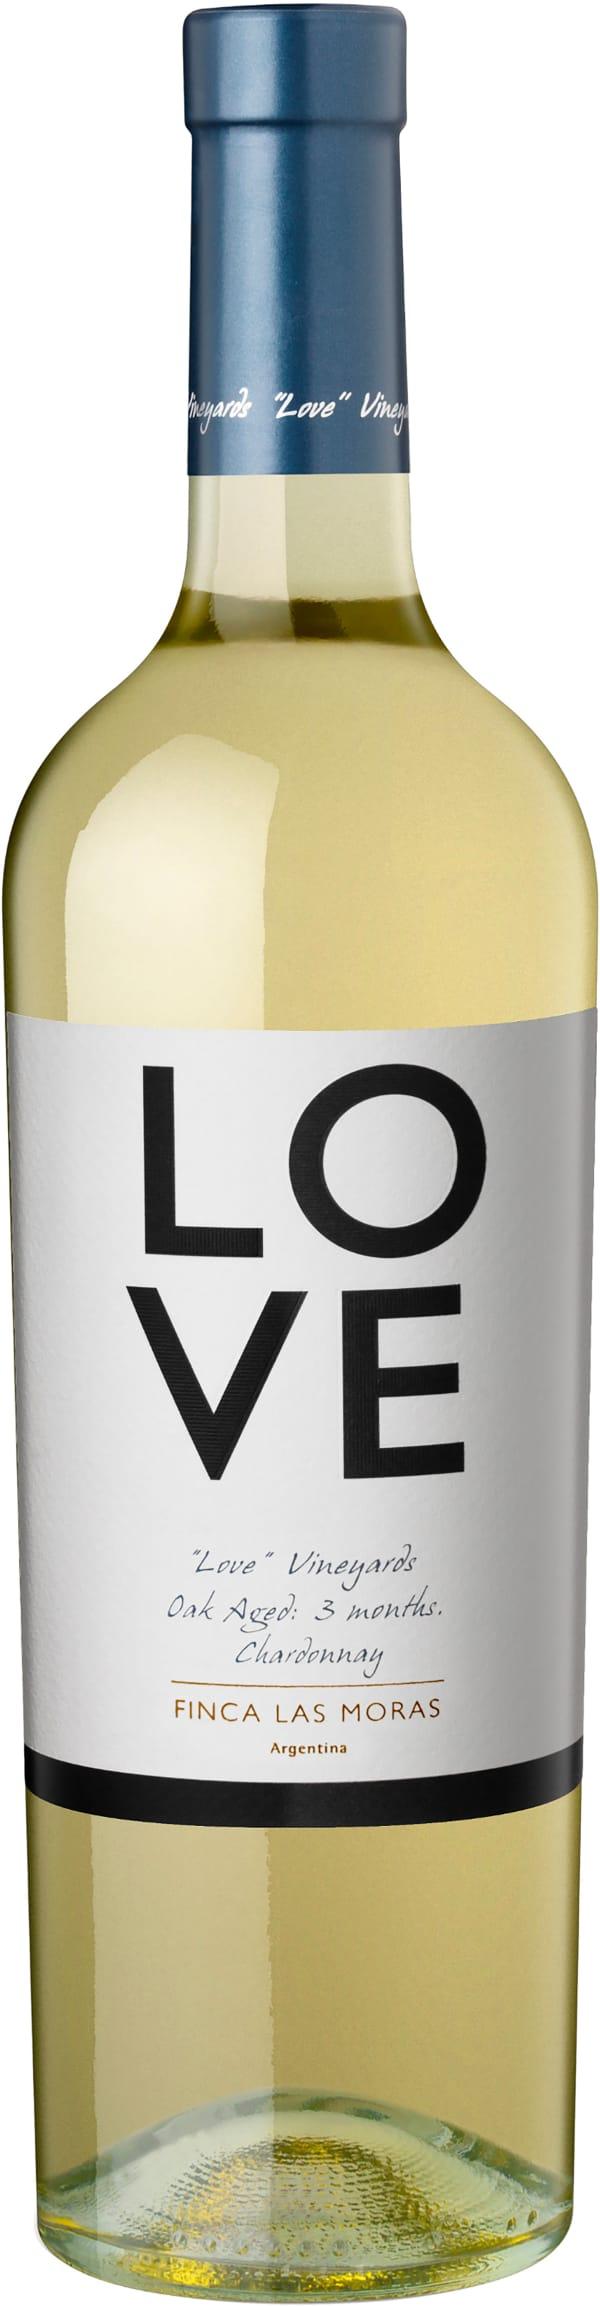 Love Chardonnay